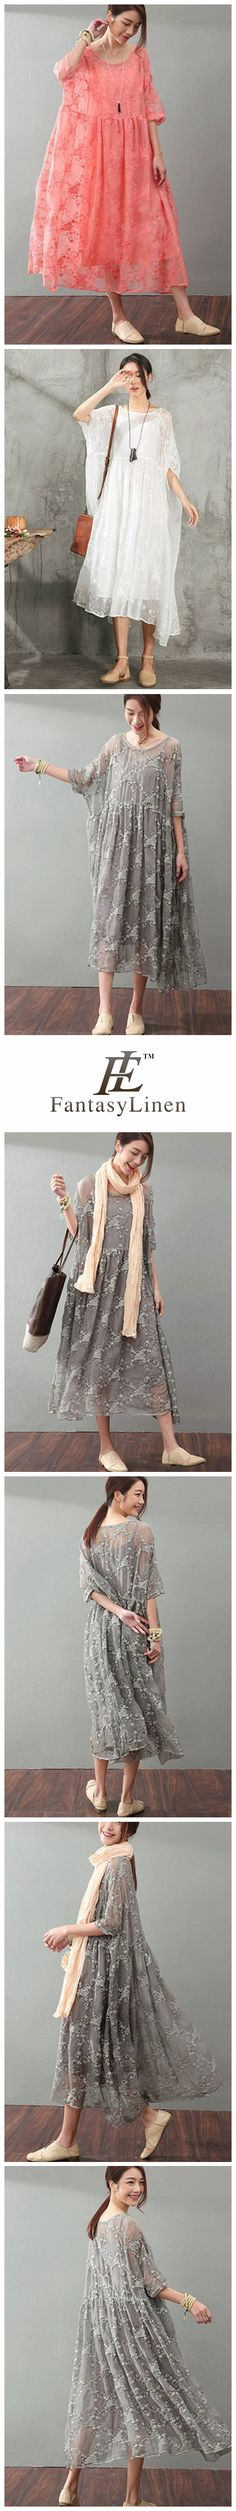 Lace Plus Size Women Dresses Maxi Clothes in Gray Q9881 Q9881Gray